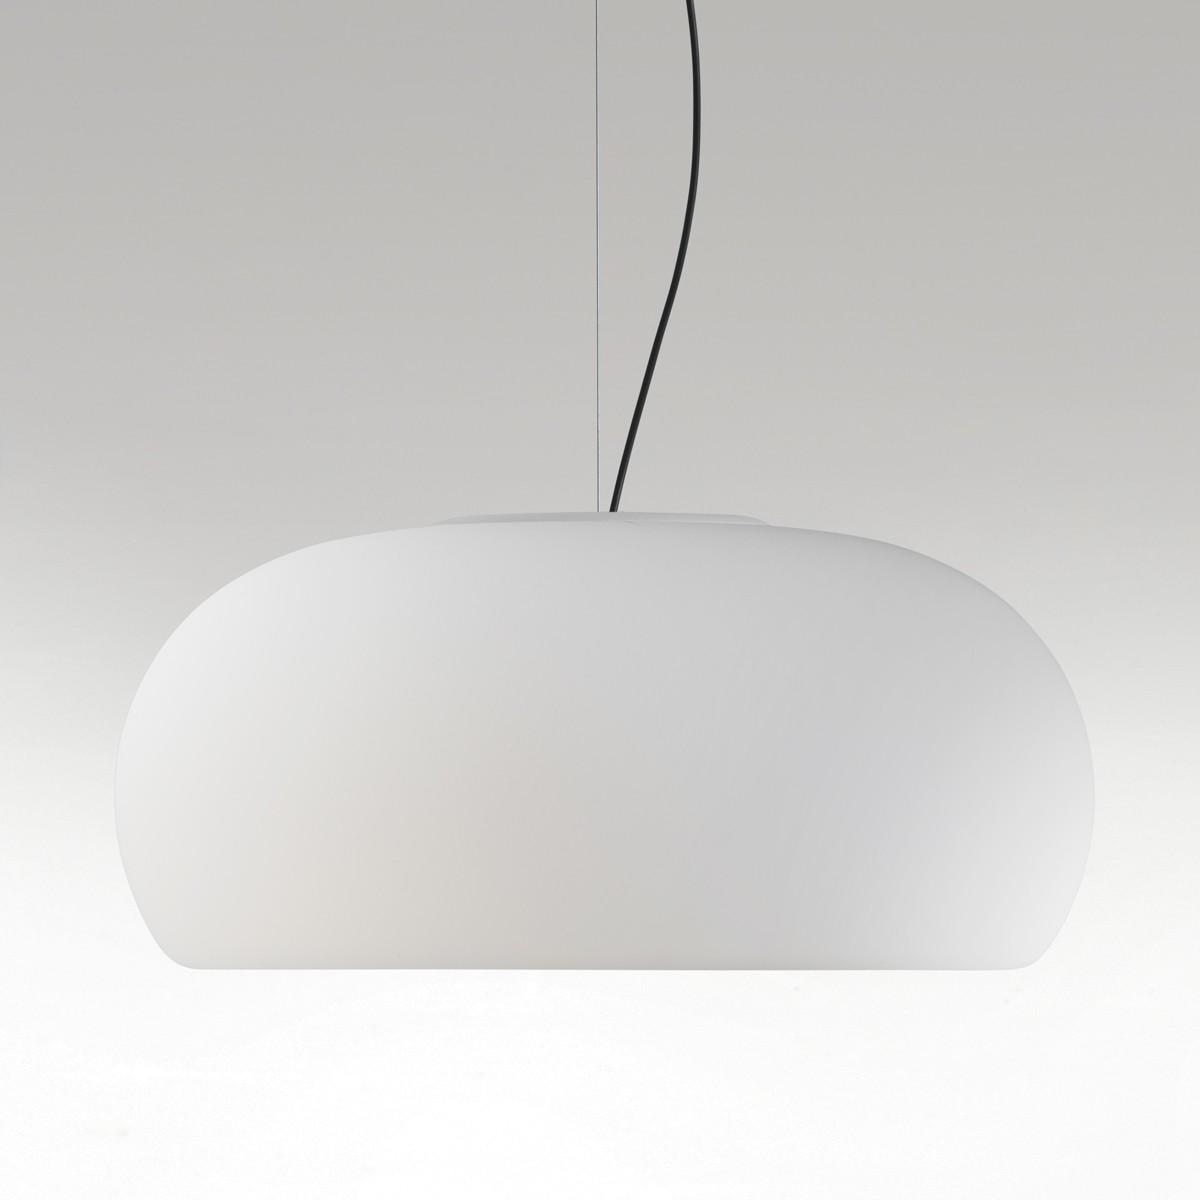 Marset Vetra LED Pendelleuchte, Ø: 43 cm, weiß